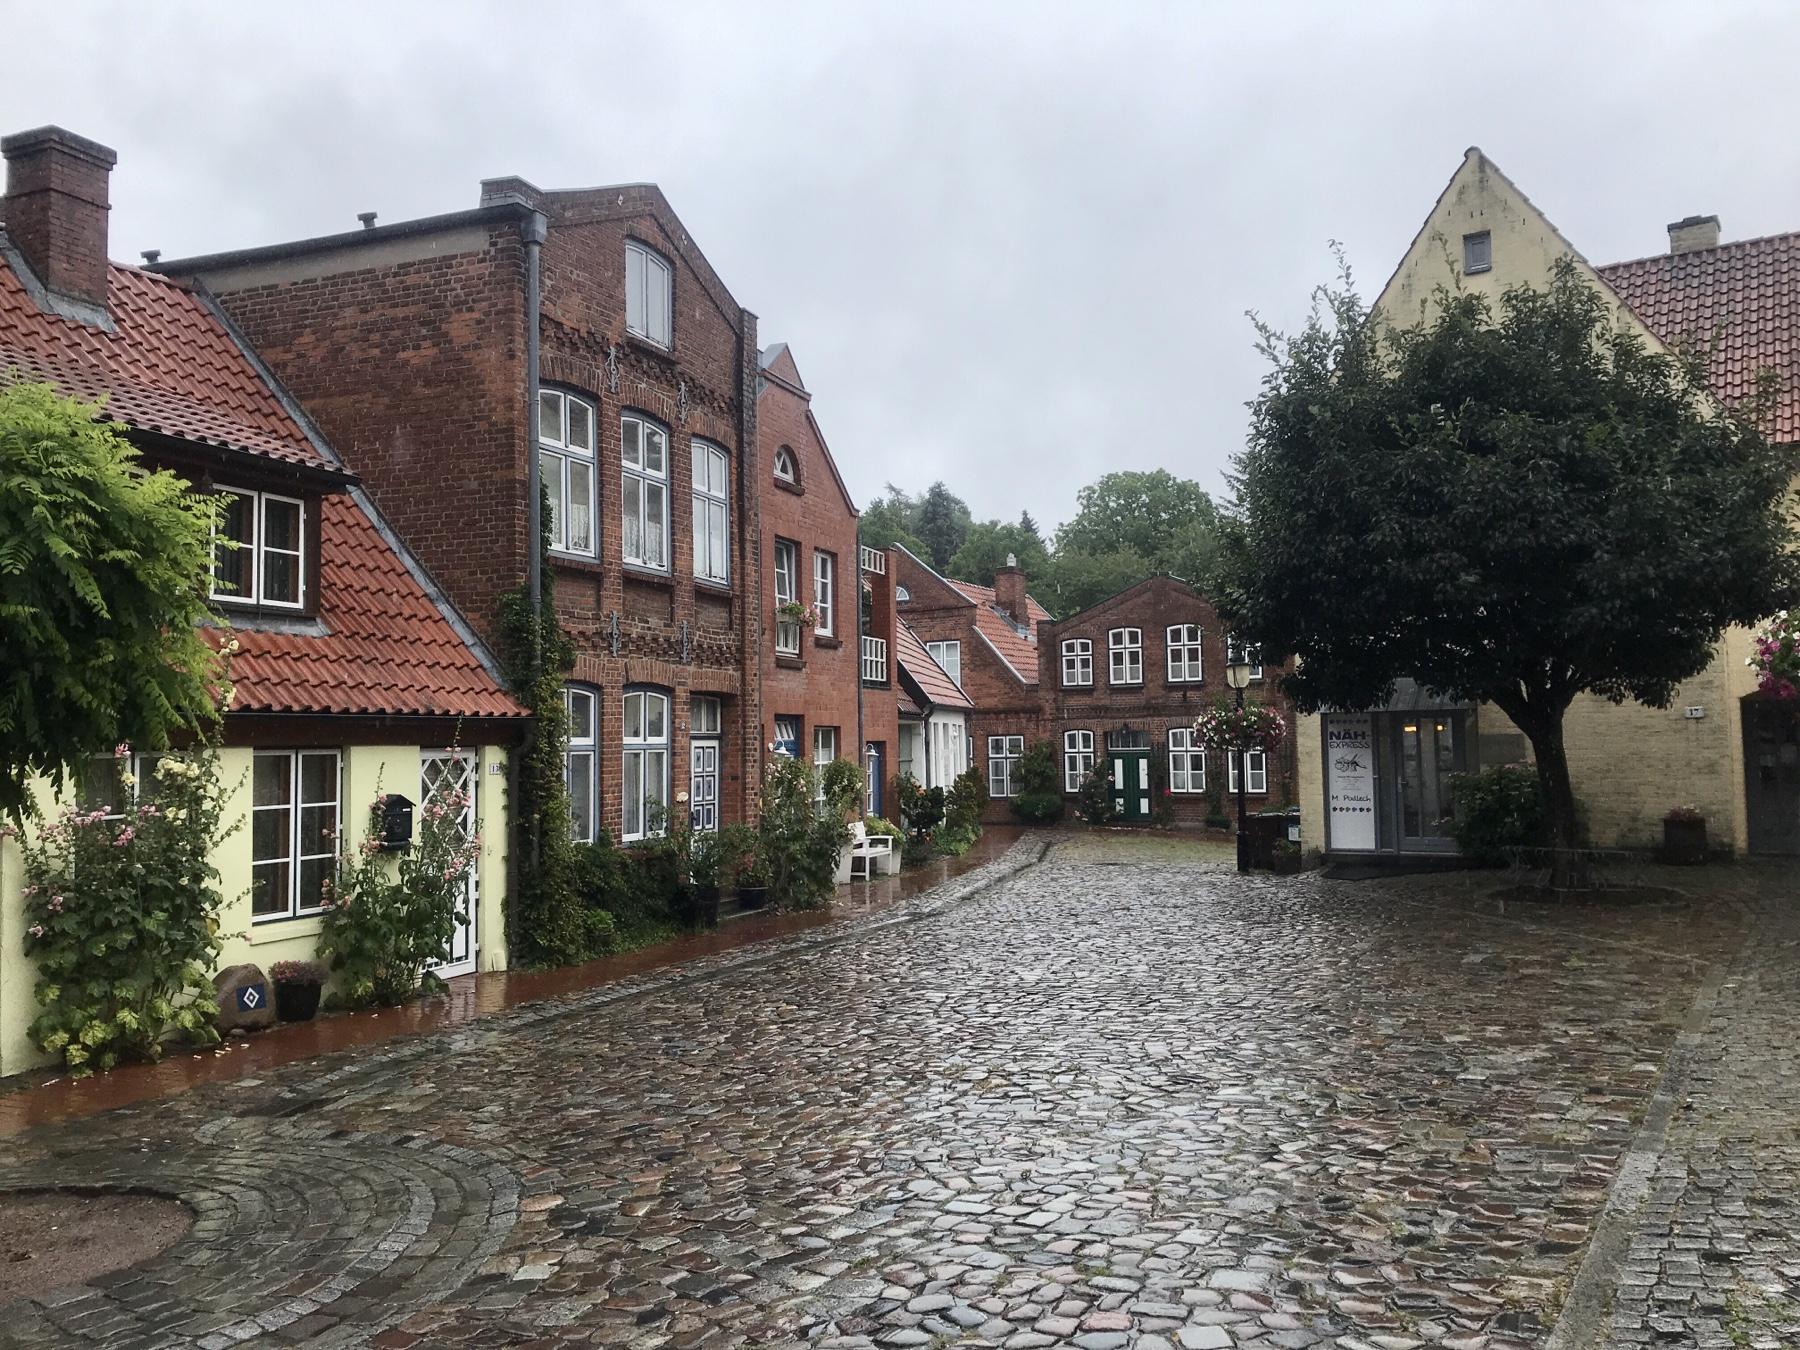 Heiligen-Geist-Viertel in Bad Oldesloe, Stormarnweg Etappe 5 nach Reinfeld